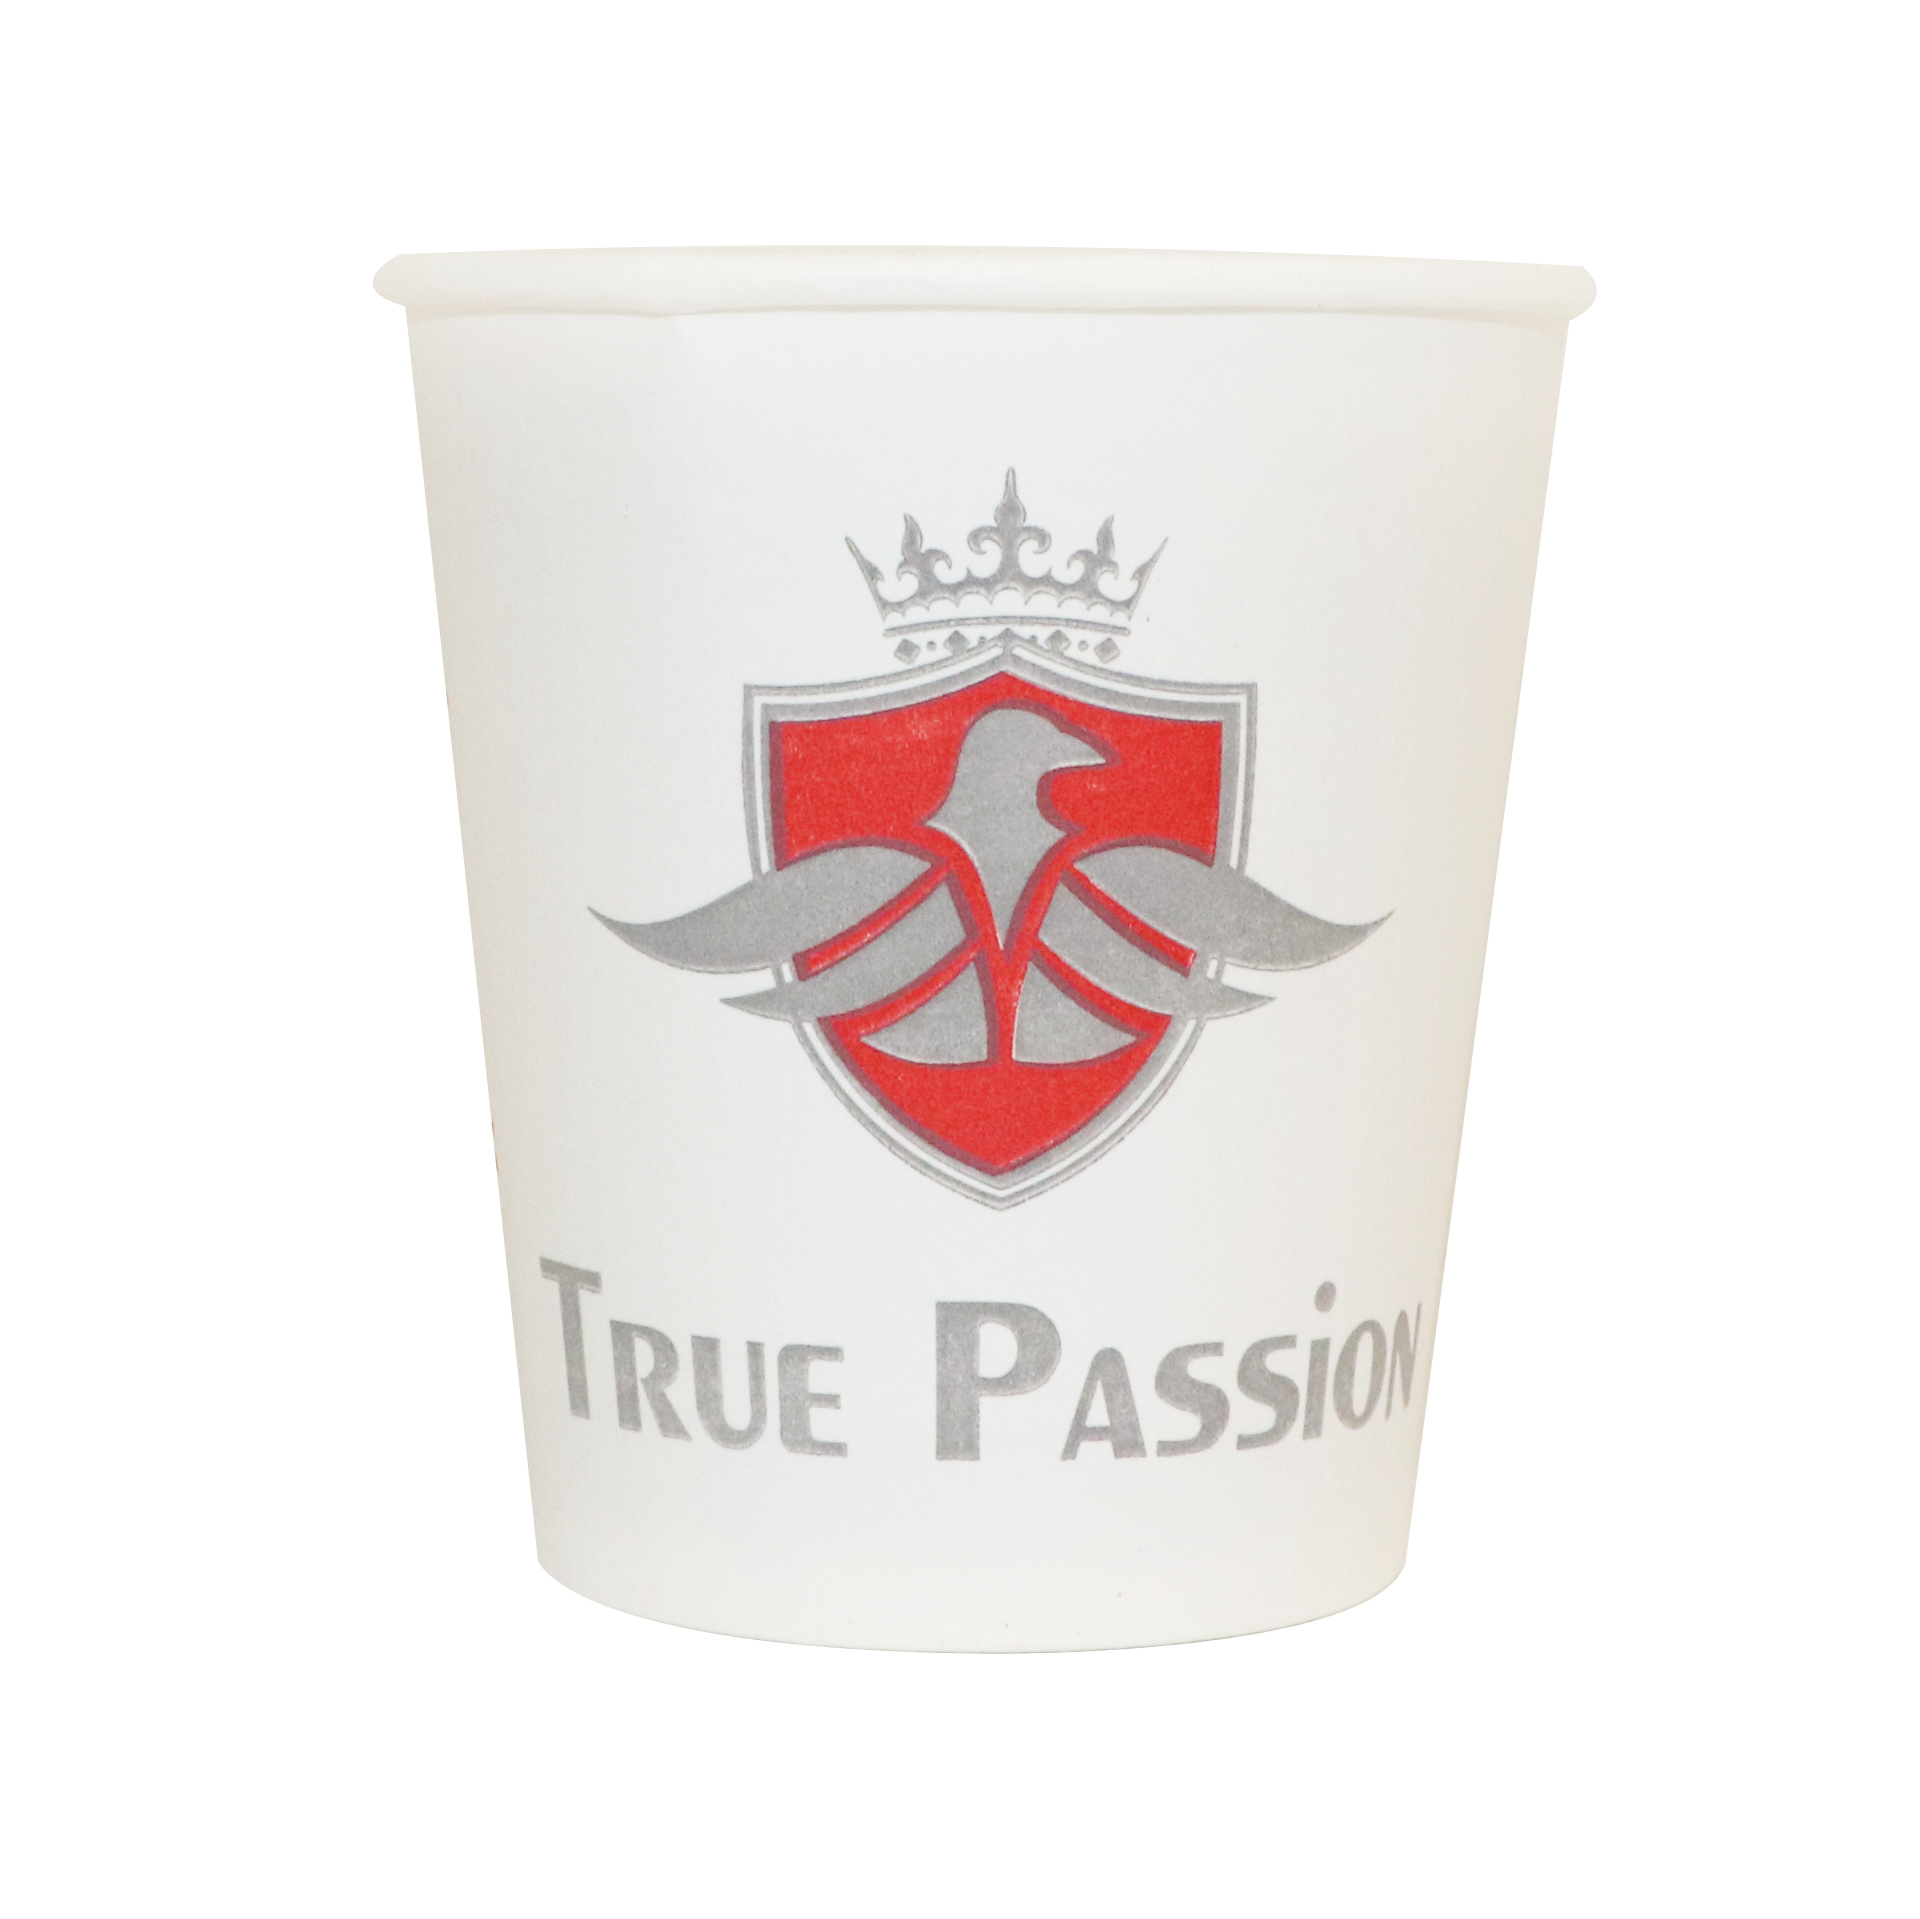 True Passion True Passion Teebecher - 25 Stück in Packung